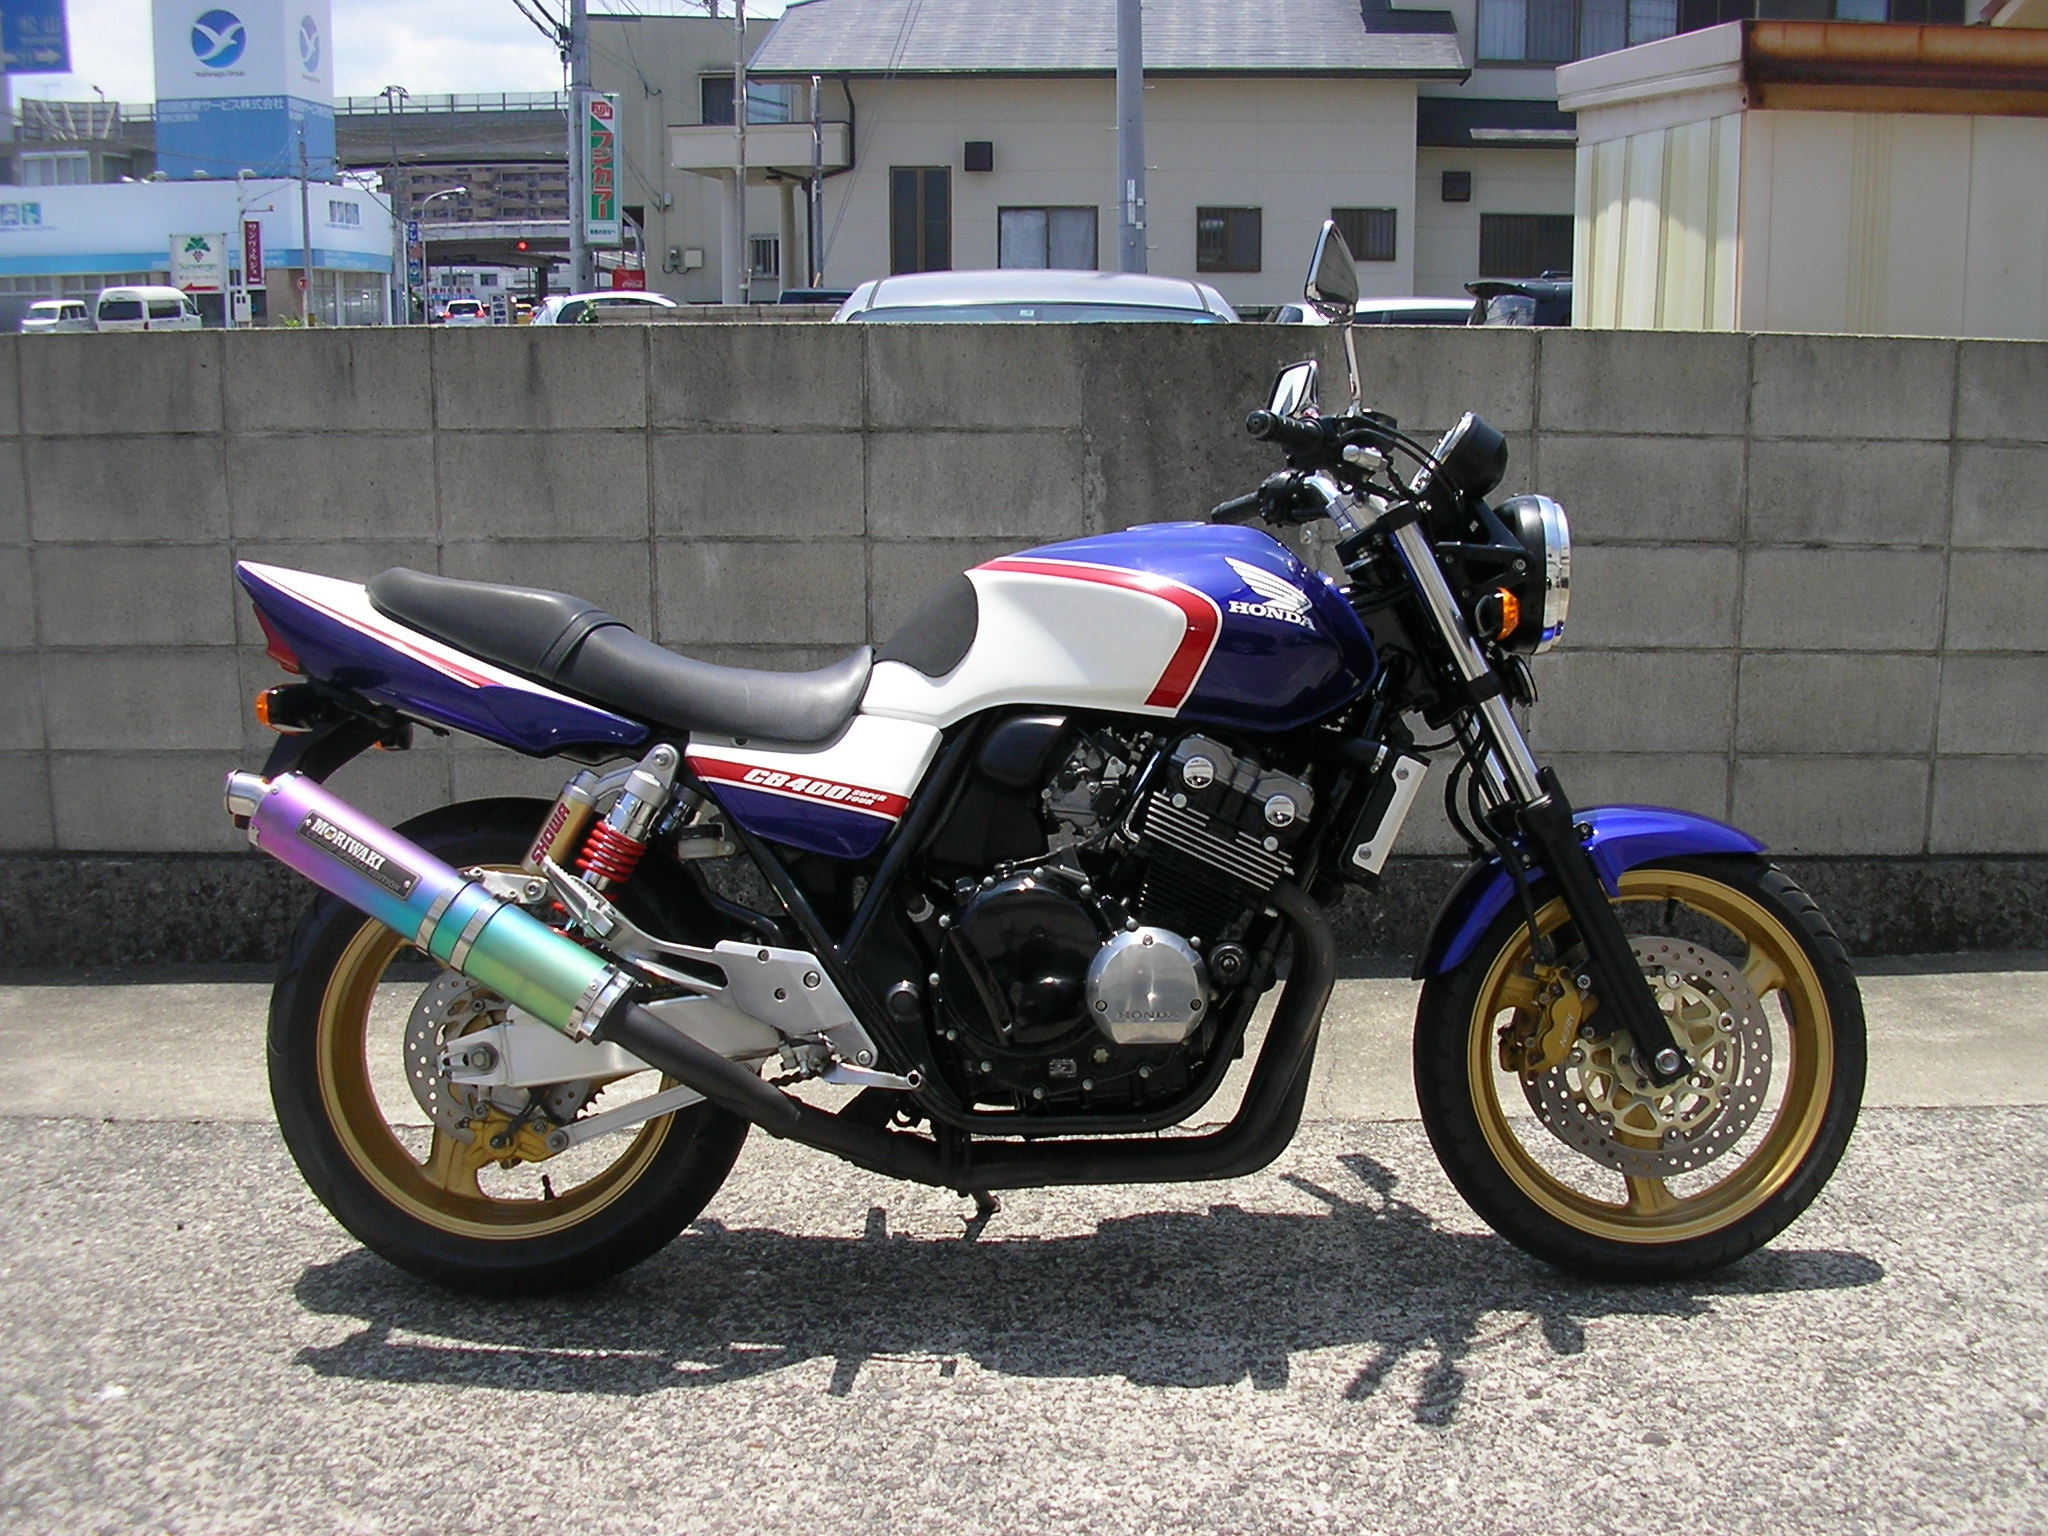 CB400SF VTEC2 (FC-000)